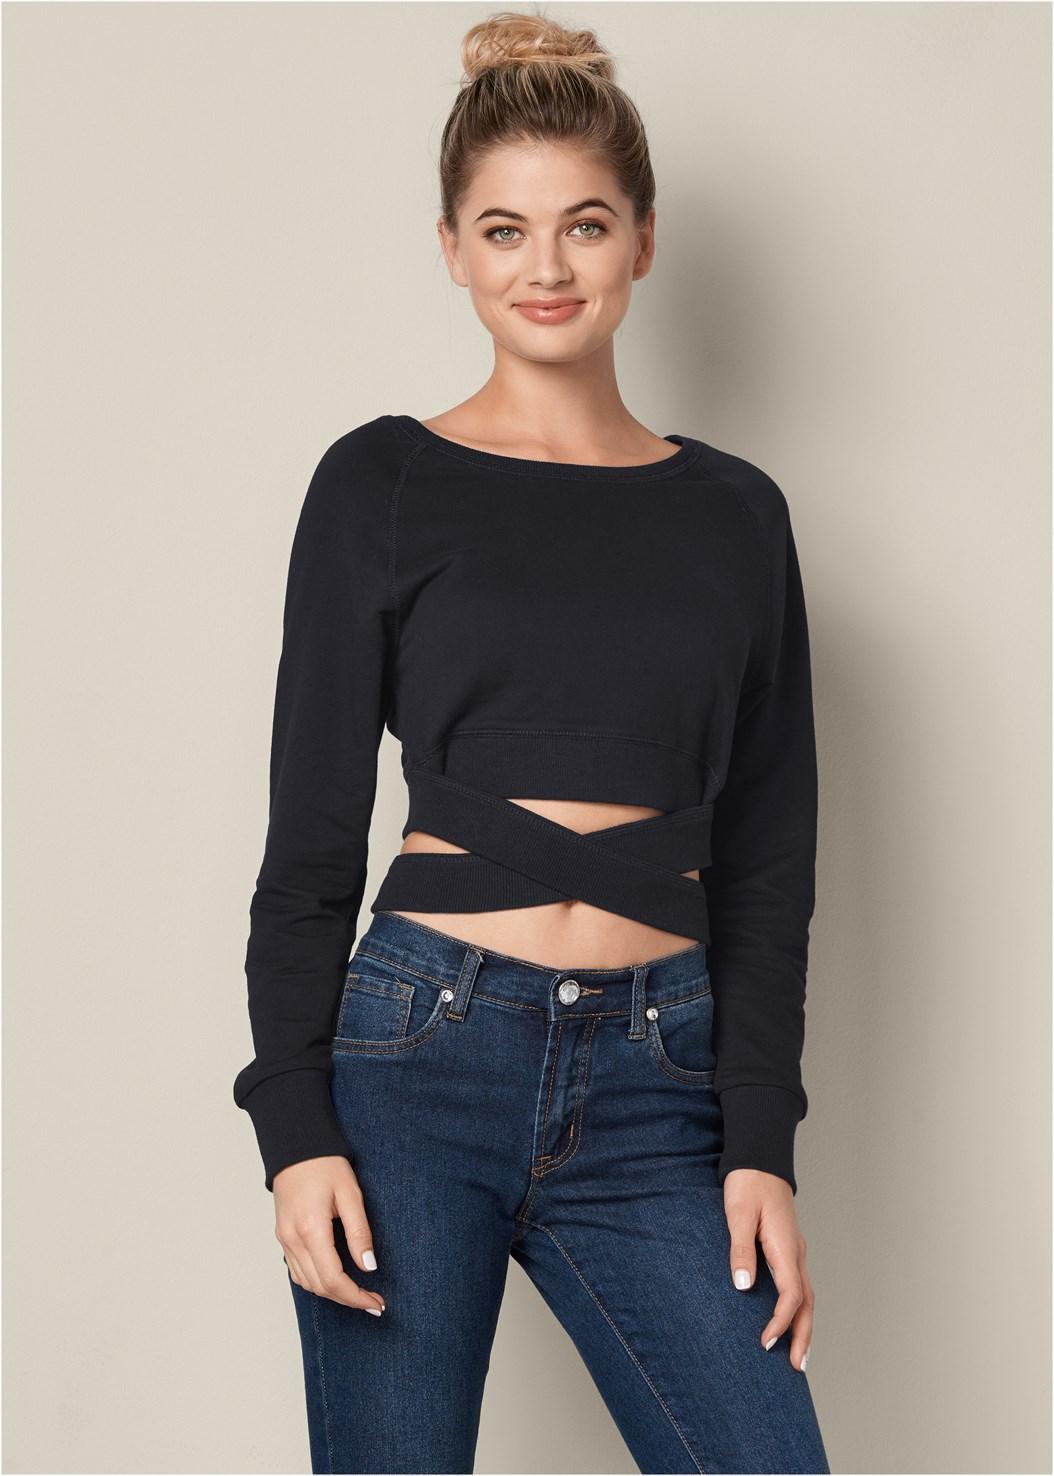 Crop Top Wrap Sweatshirt,Color Skinny Jeans